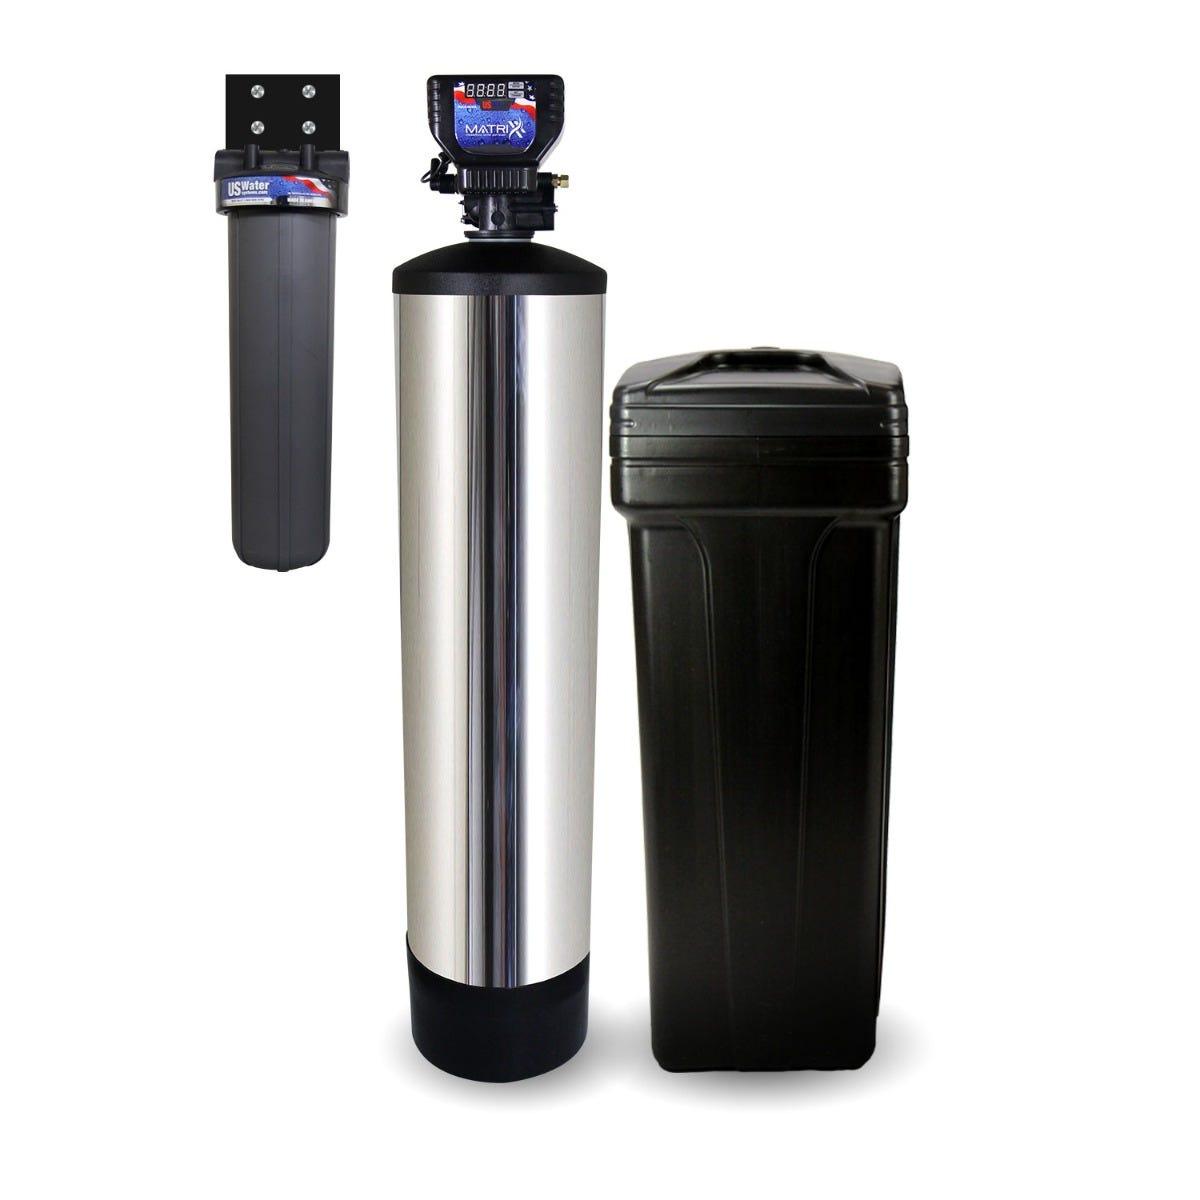 Fusion Nlt Professional Grade Metered Water Softener